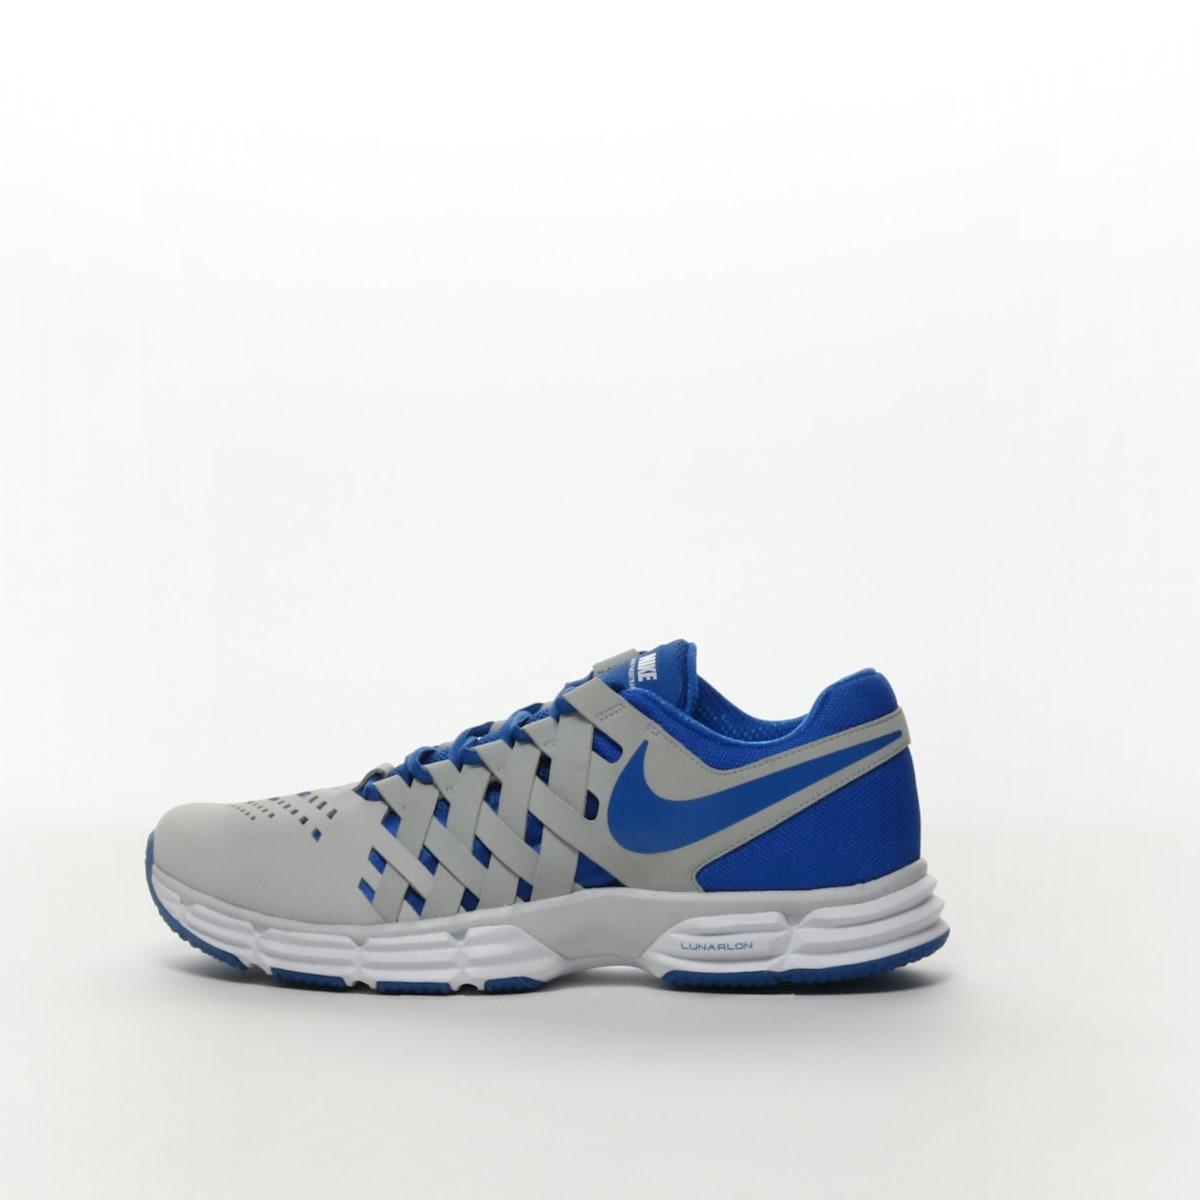 f4e5f382a2e9 Men s Nike Lunar Fingertrap Training Shoe - PURE PLATINUM HYPER ...